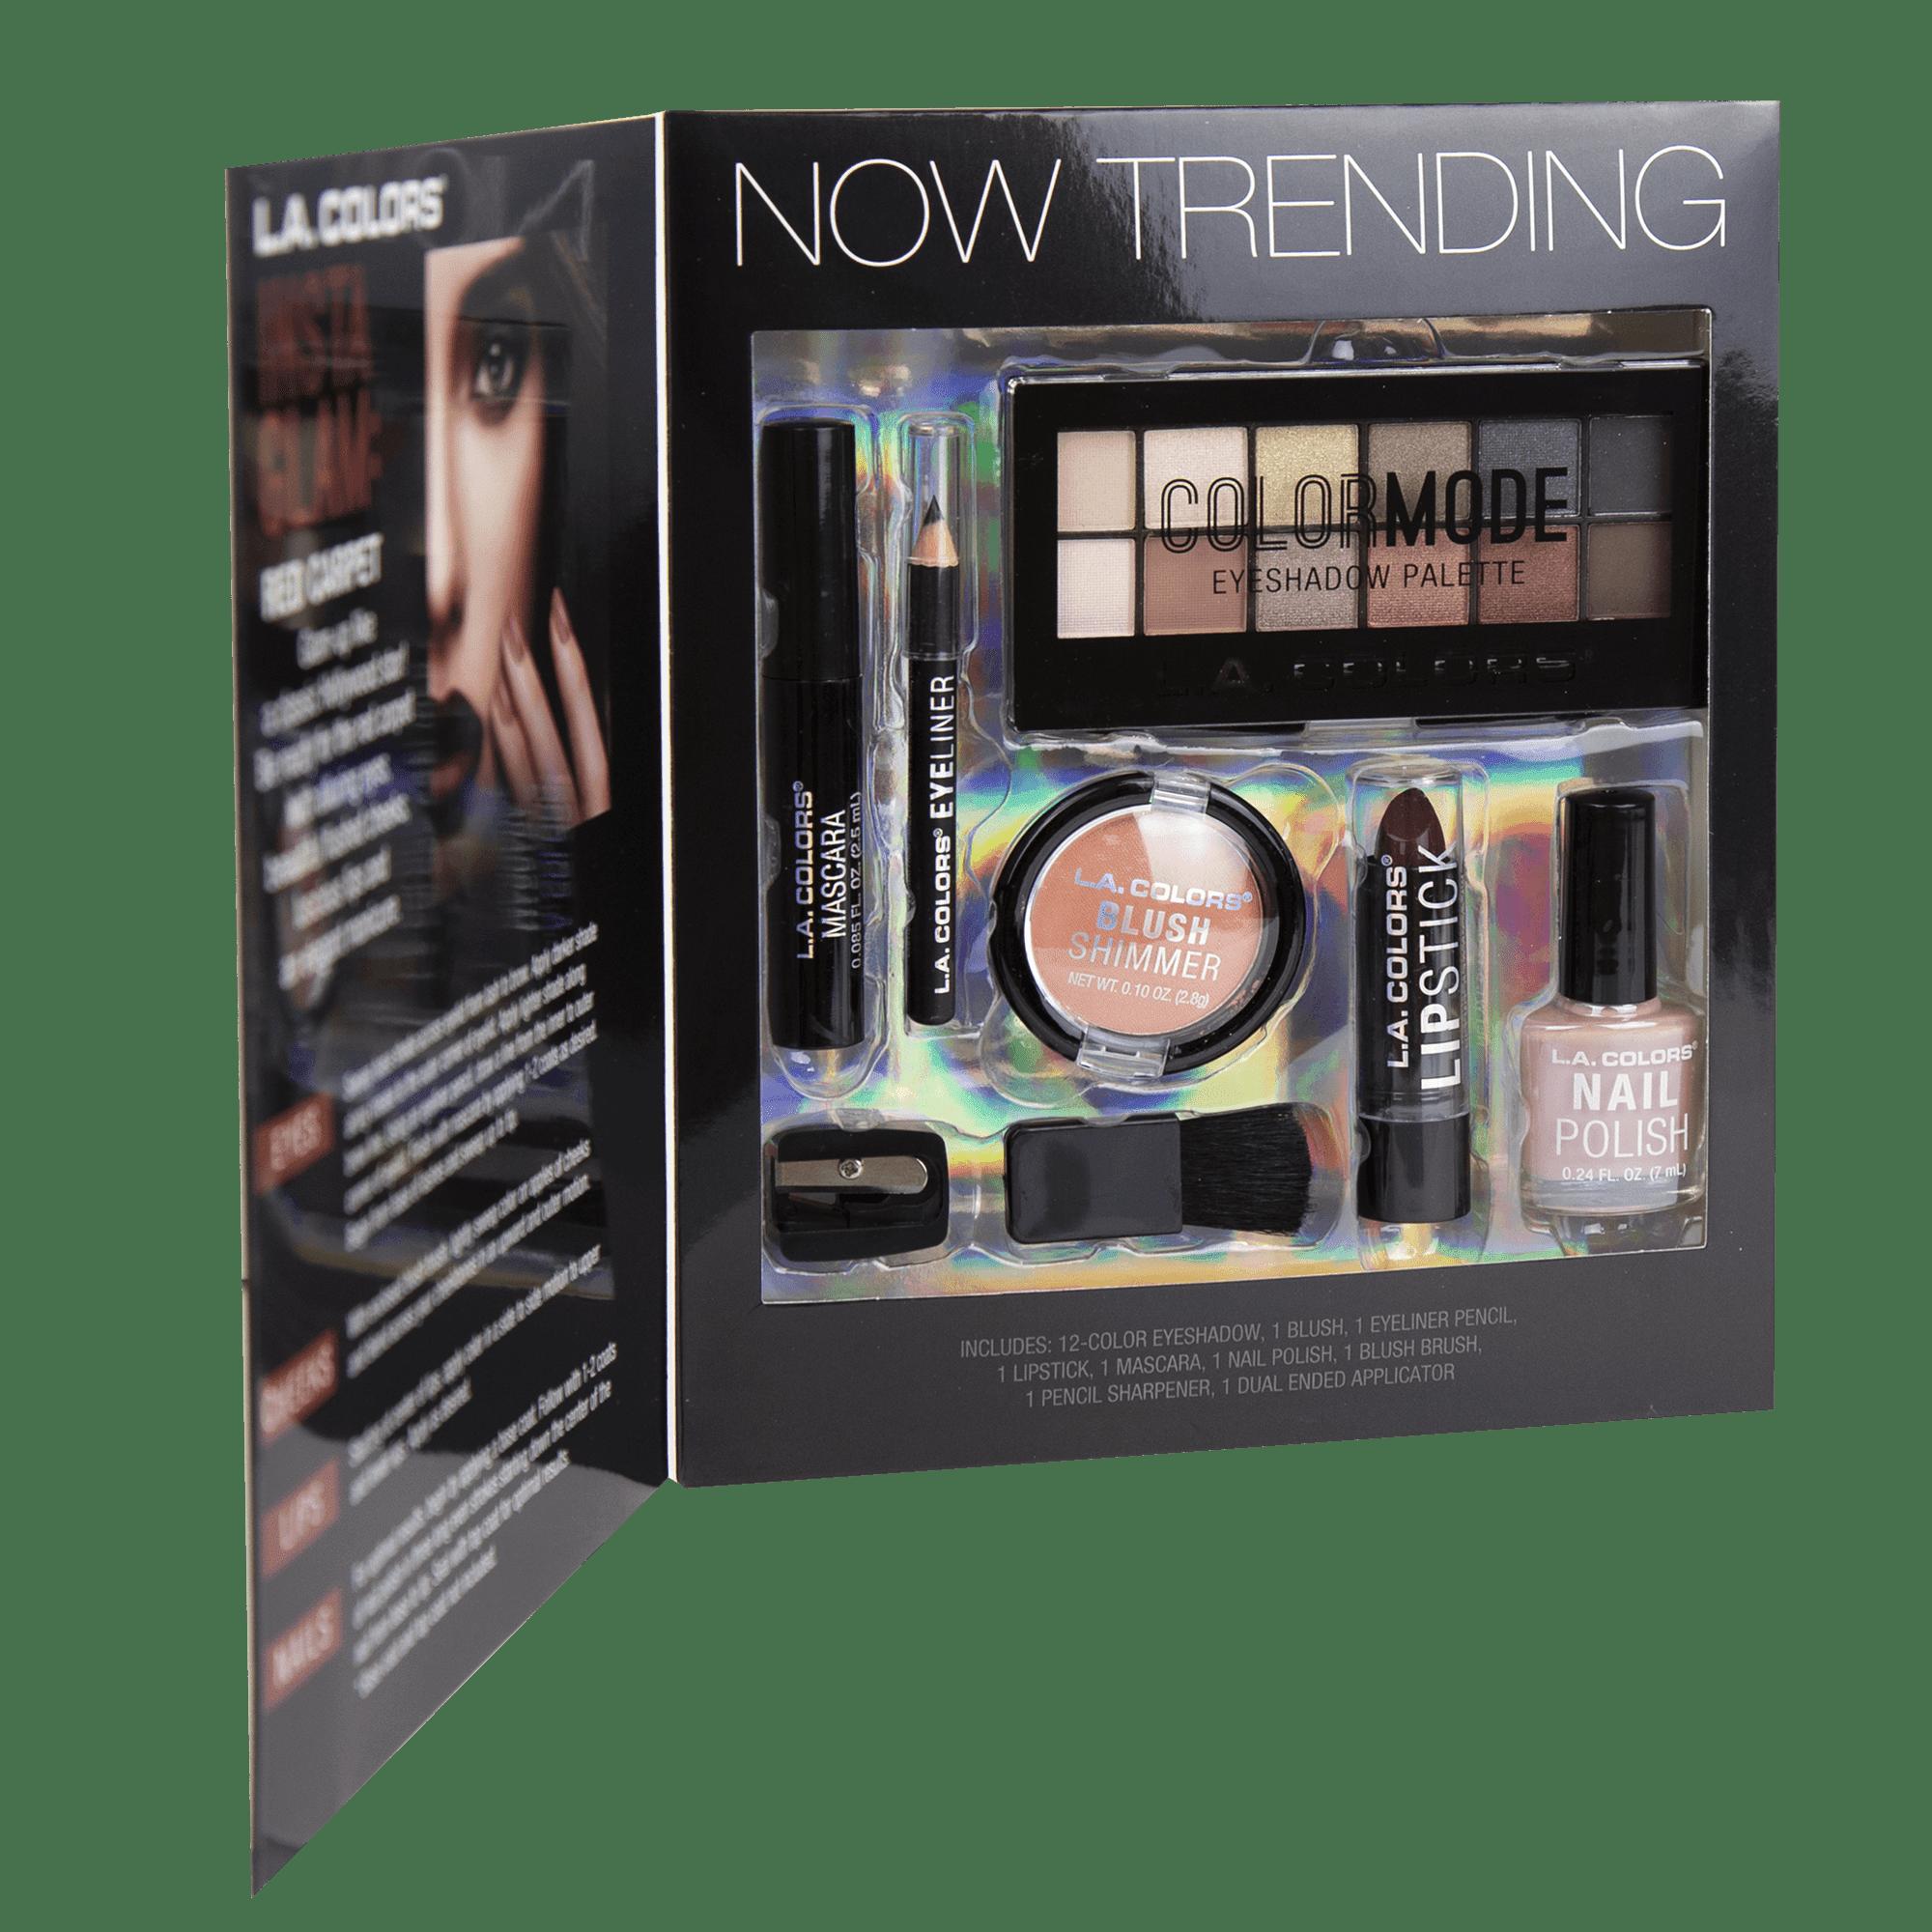 La Colors Holiday Gift Sets 5 Color Matte Eyeshadow Palette